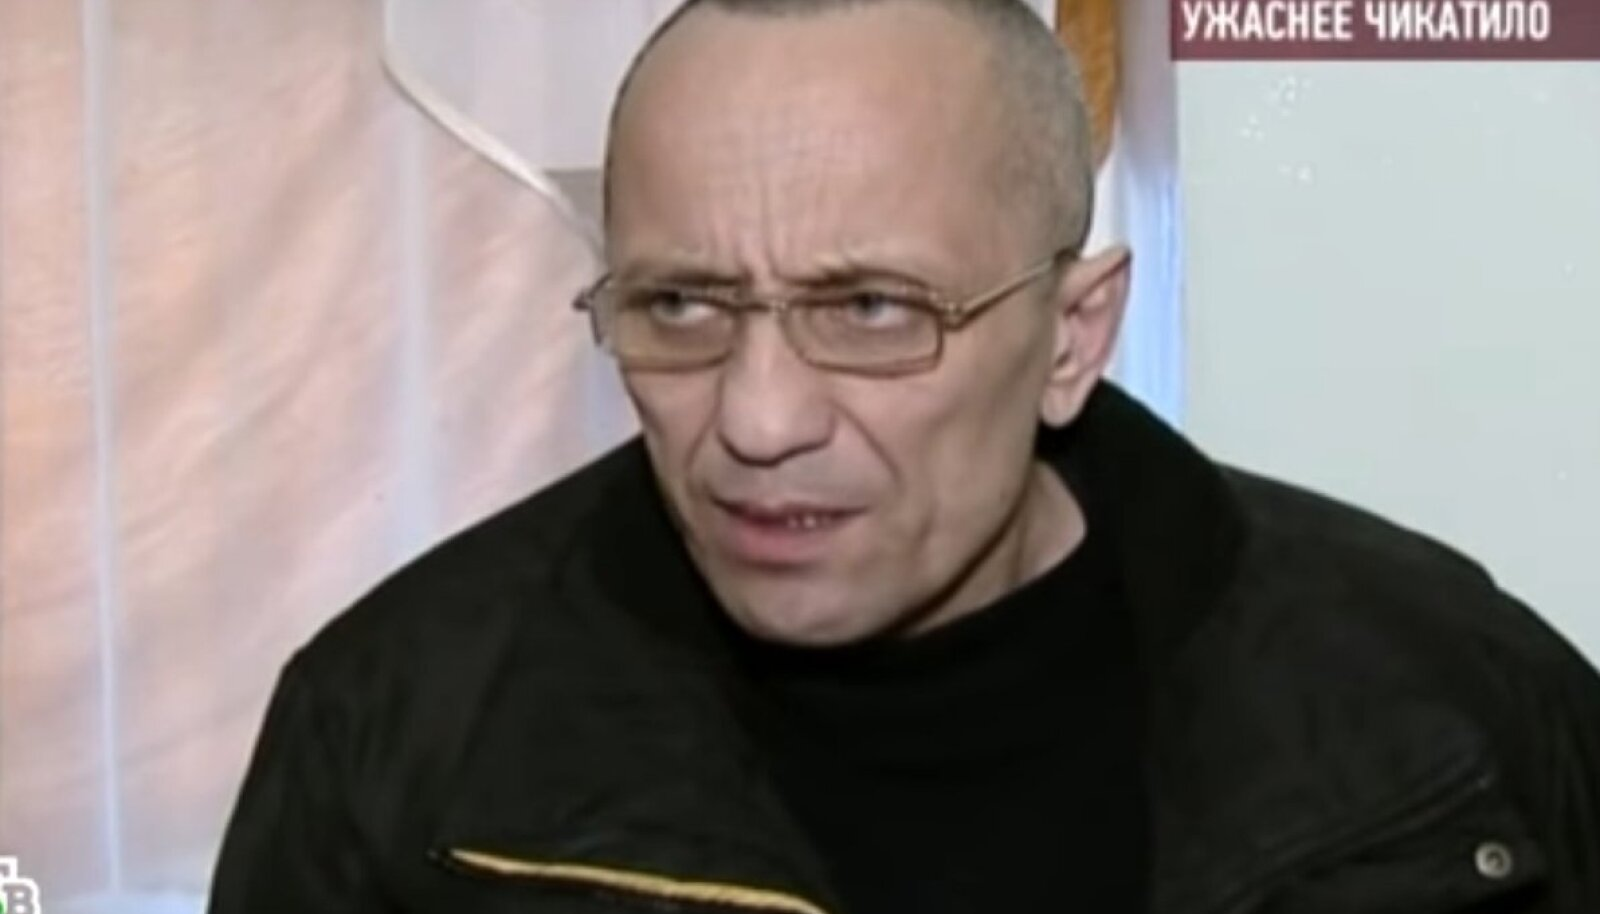 Mihhail Popkov